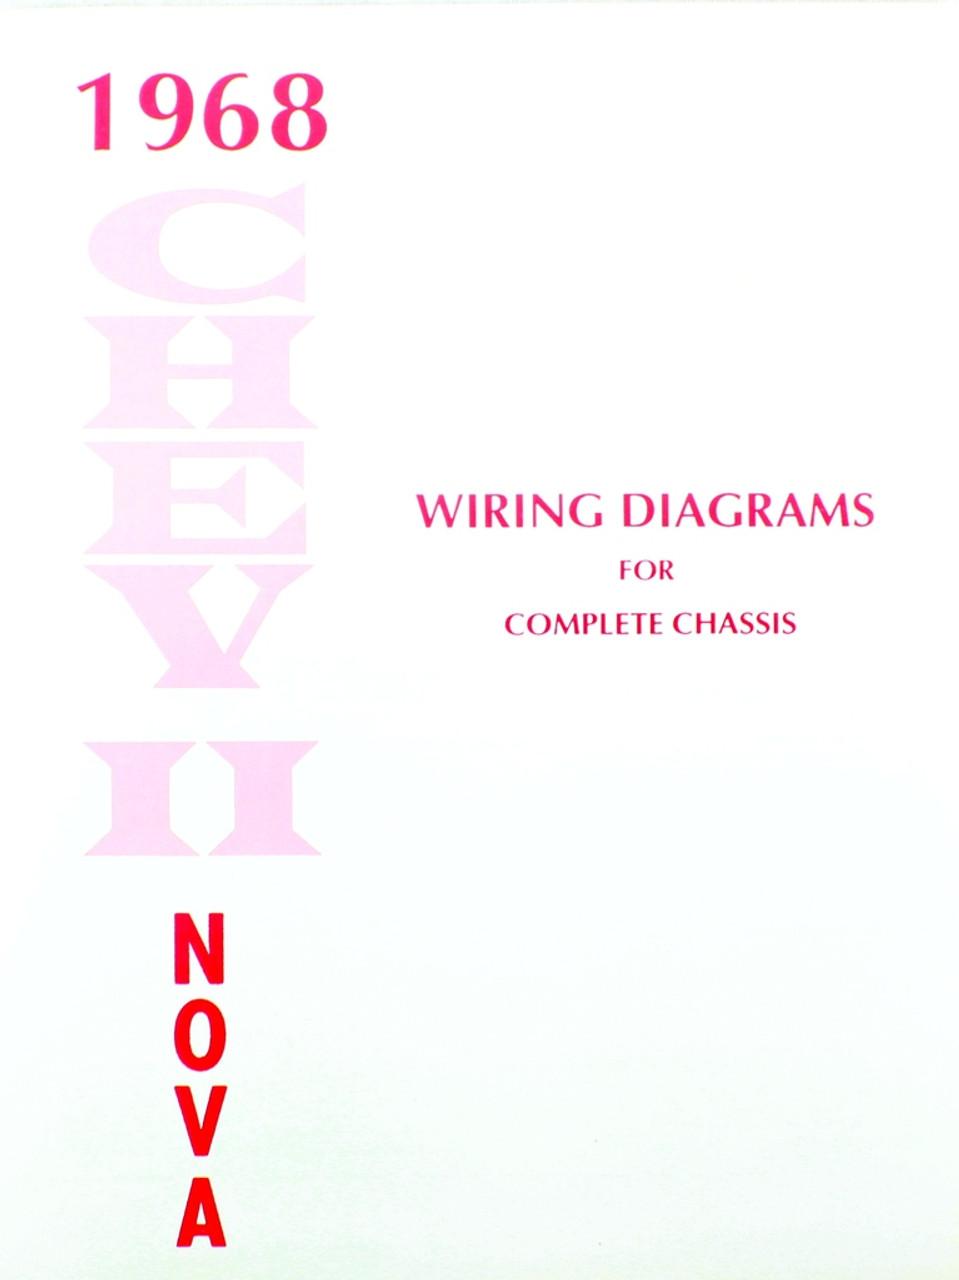 68 1968 Chevy Nova Electrical Wiring Diagram Manual - I-5 Classic Chevy